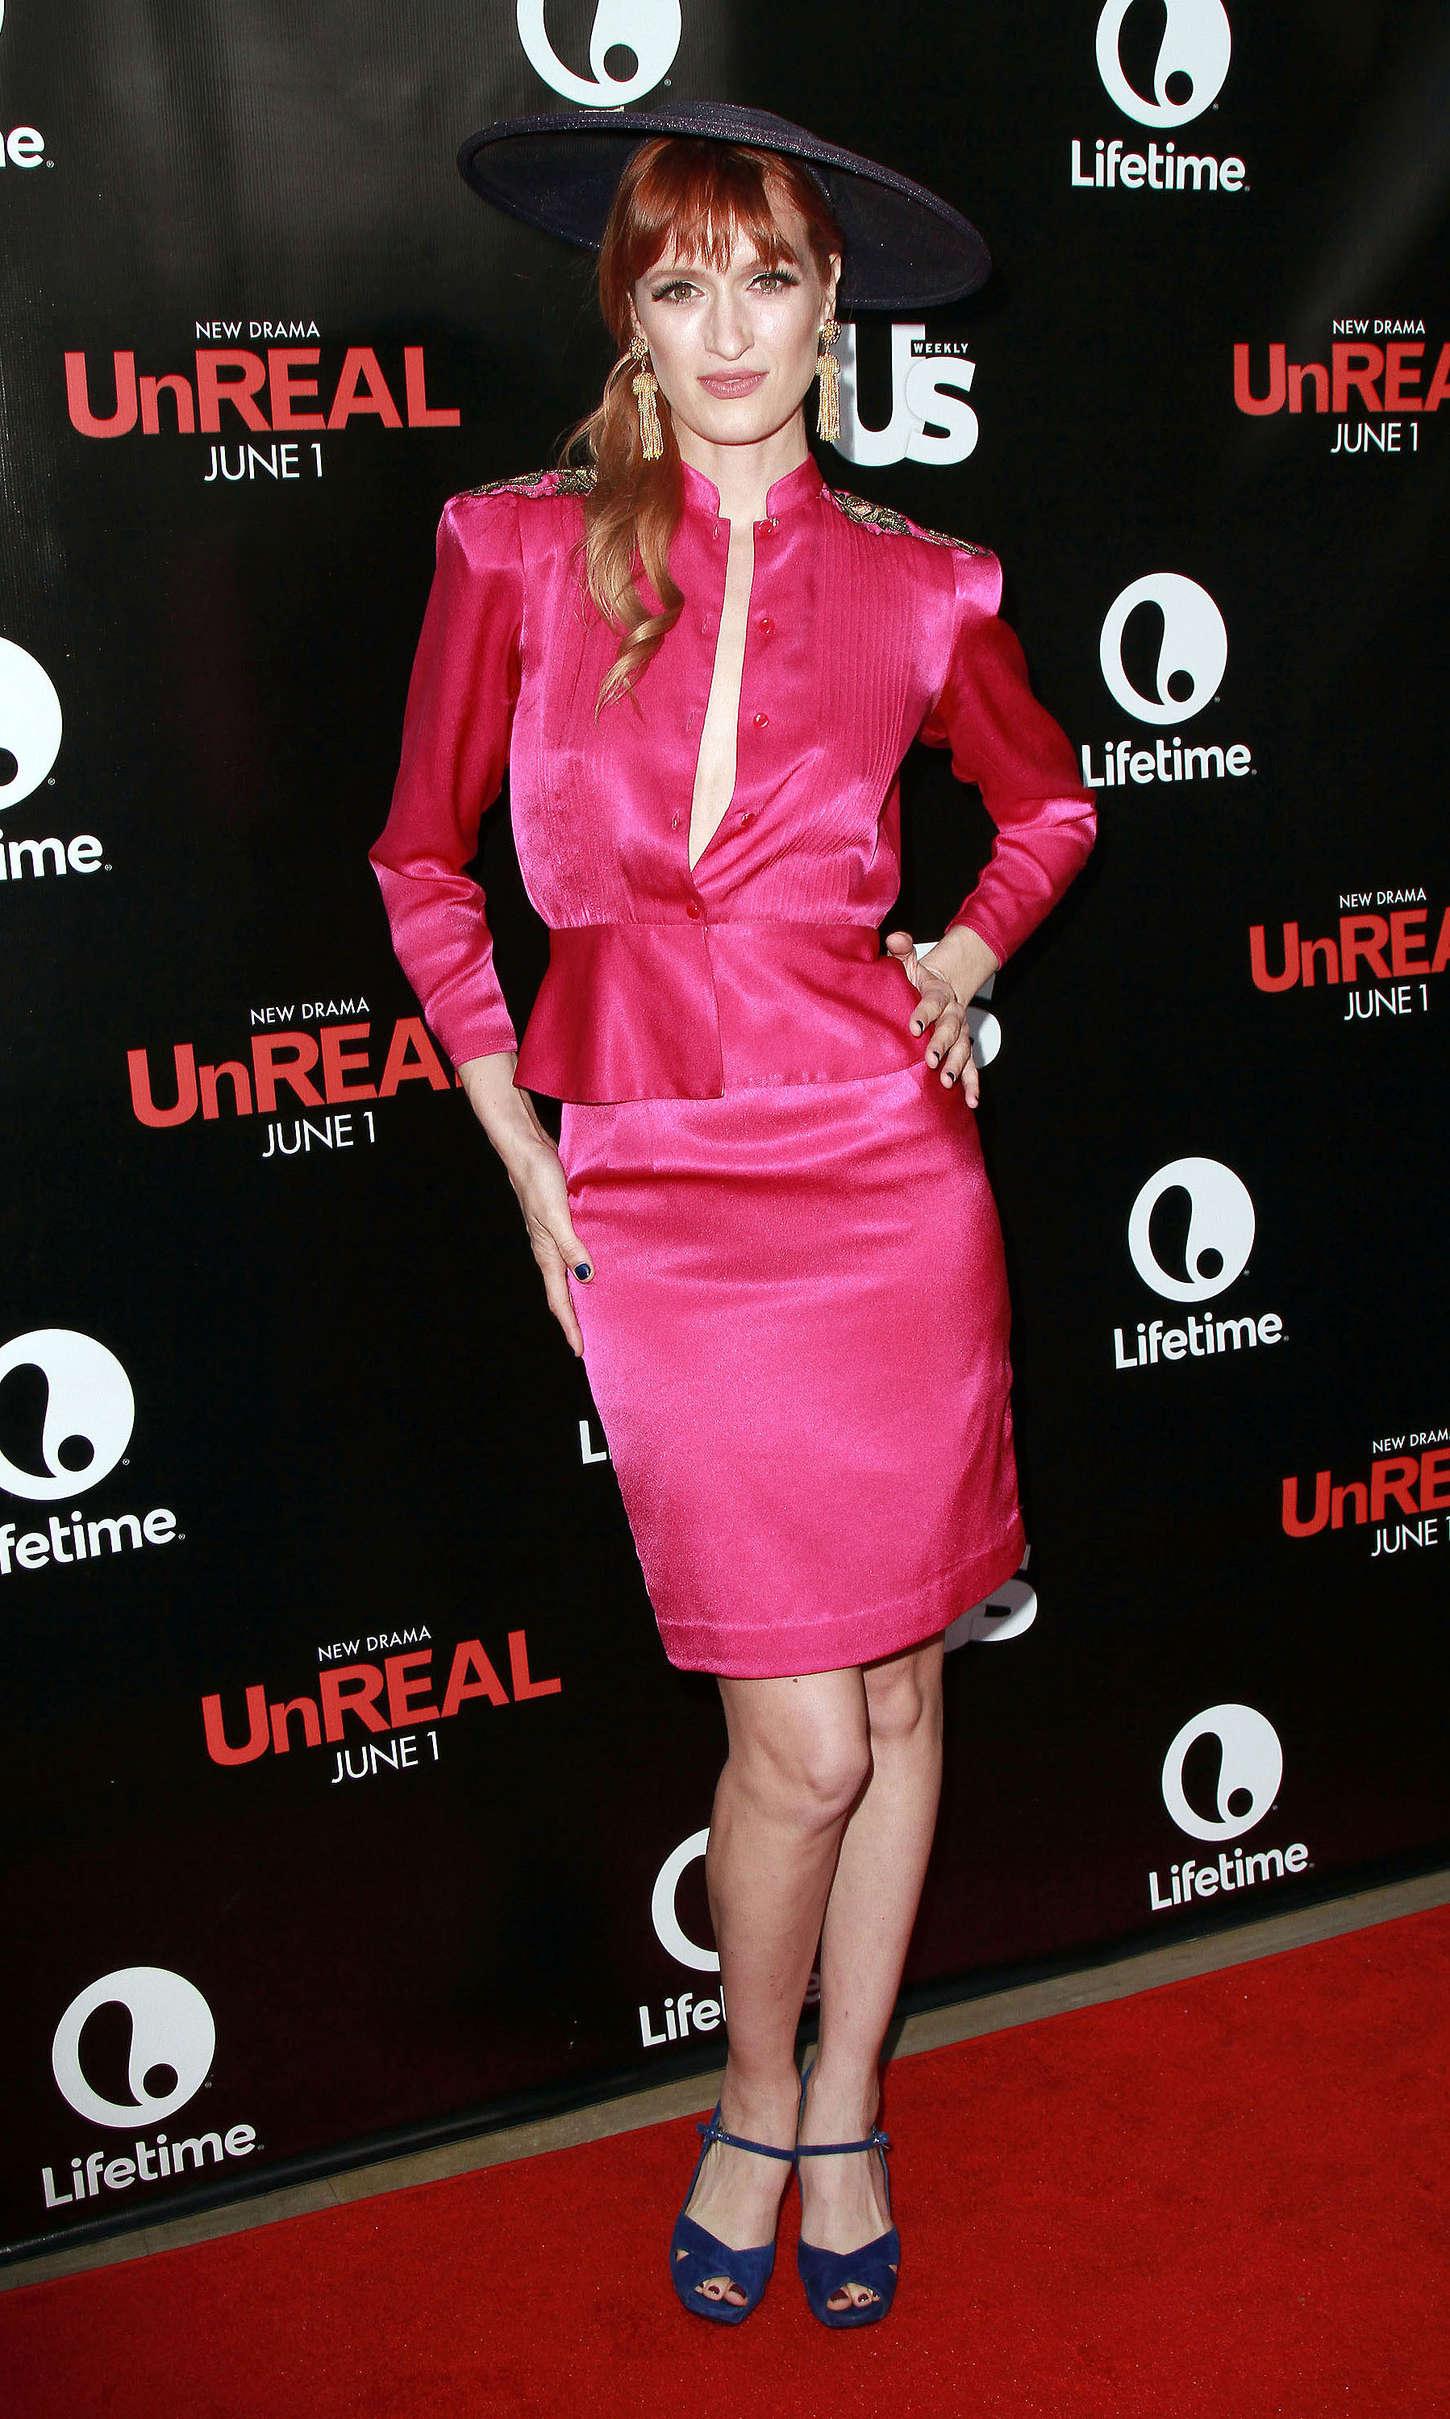 Breeda Wool: UnReal Premiere Party -04 - Full Size